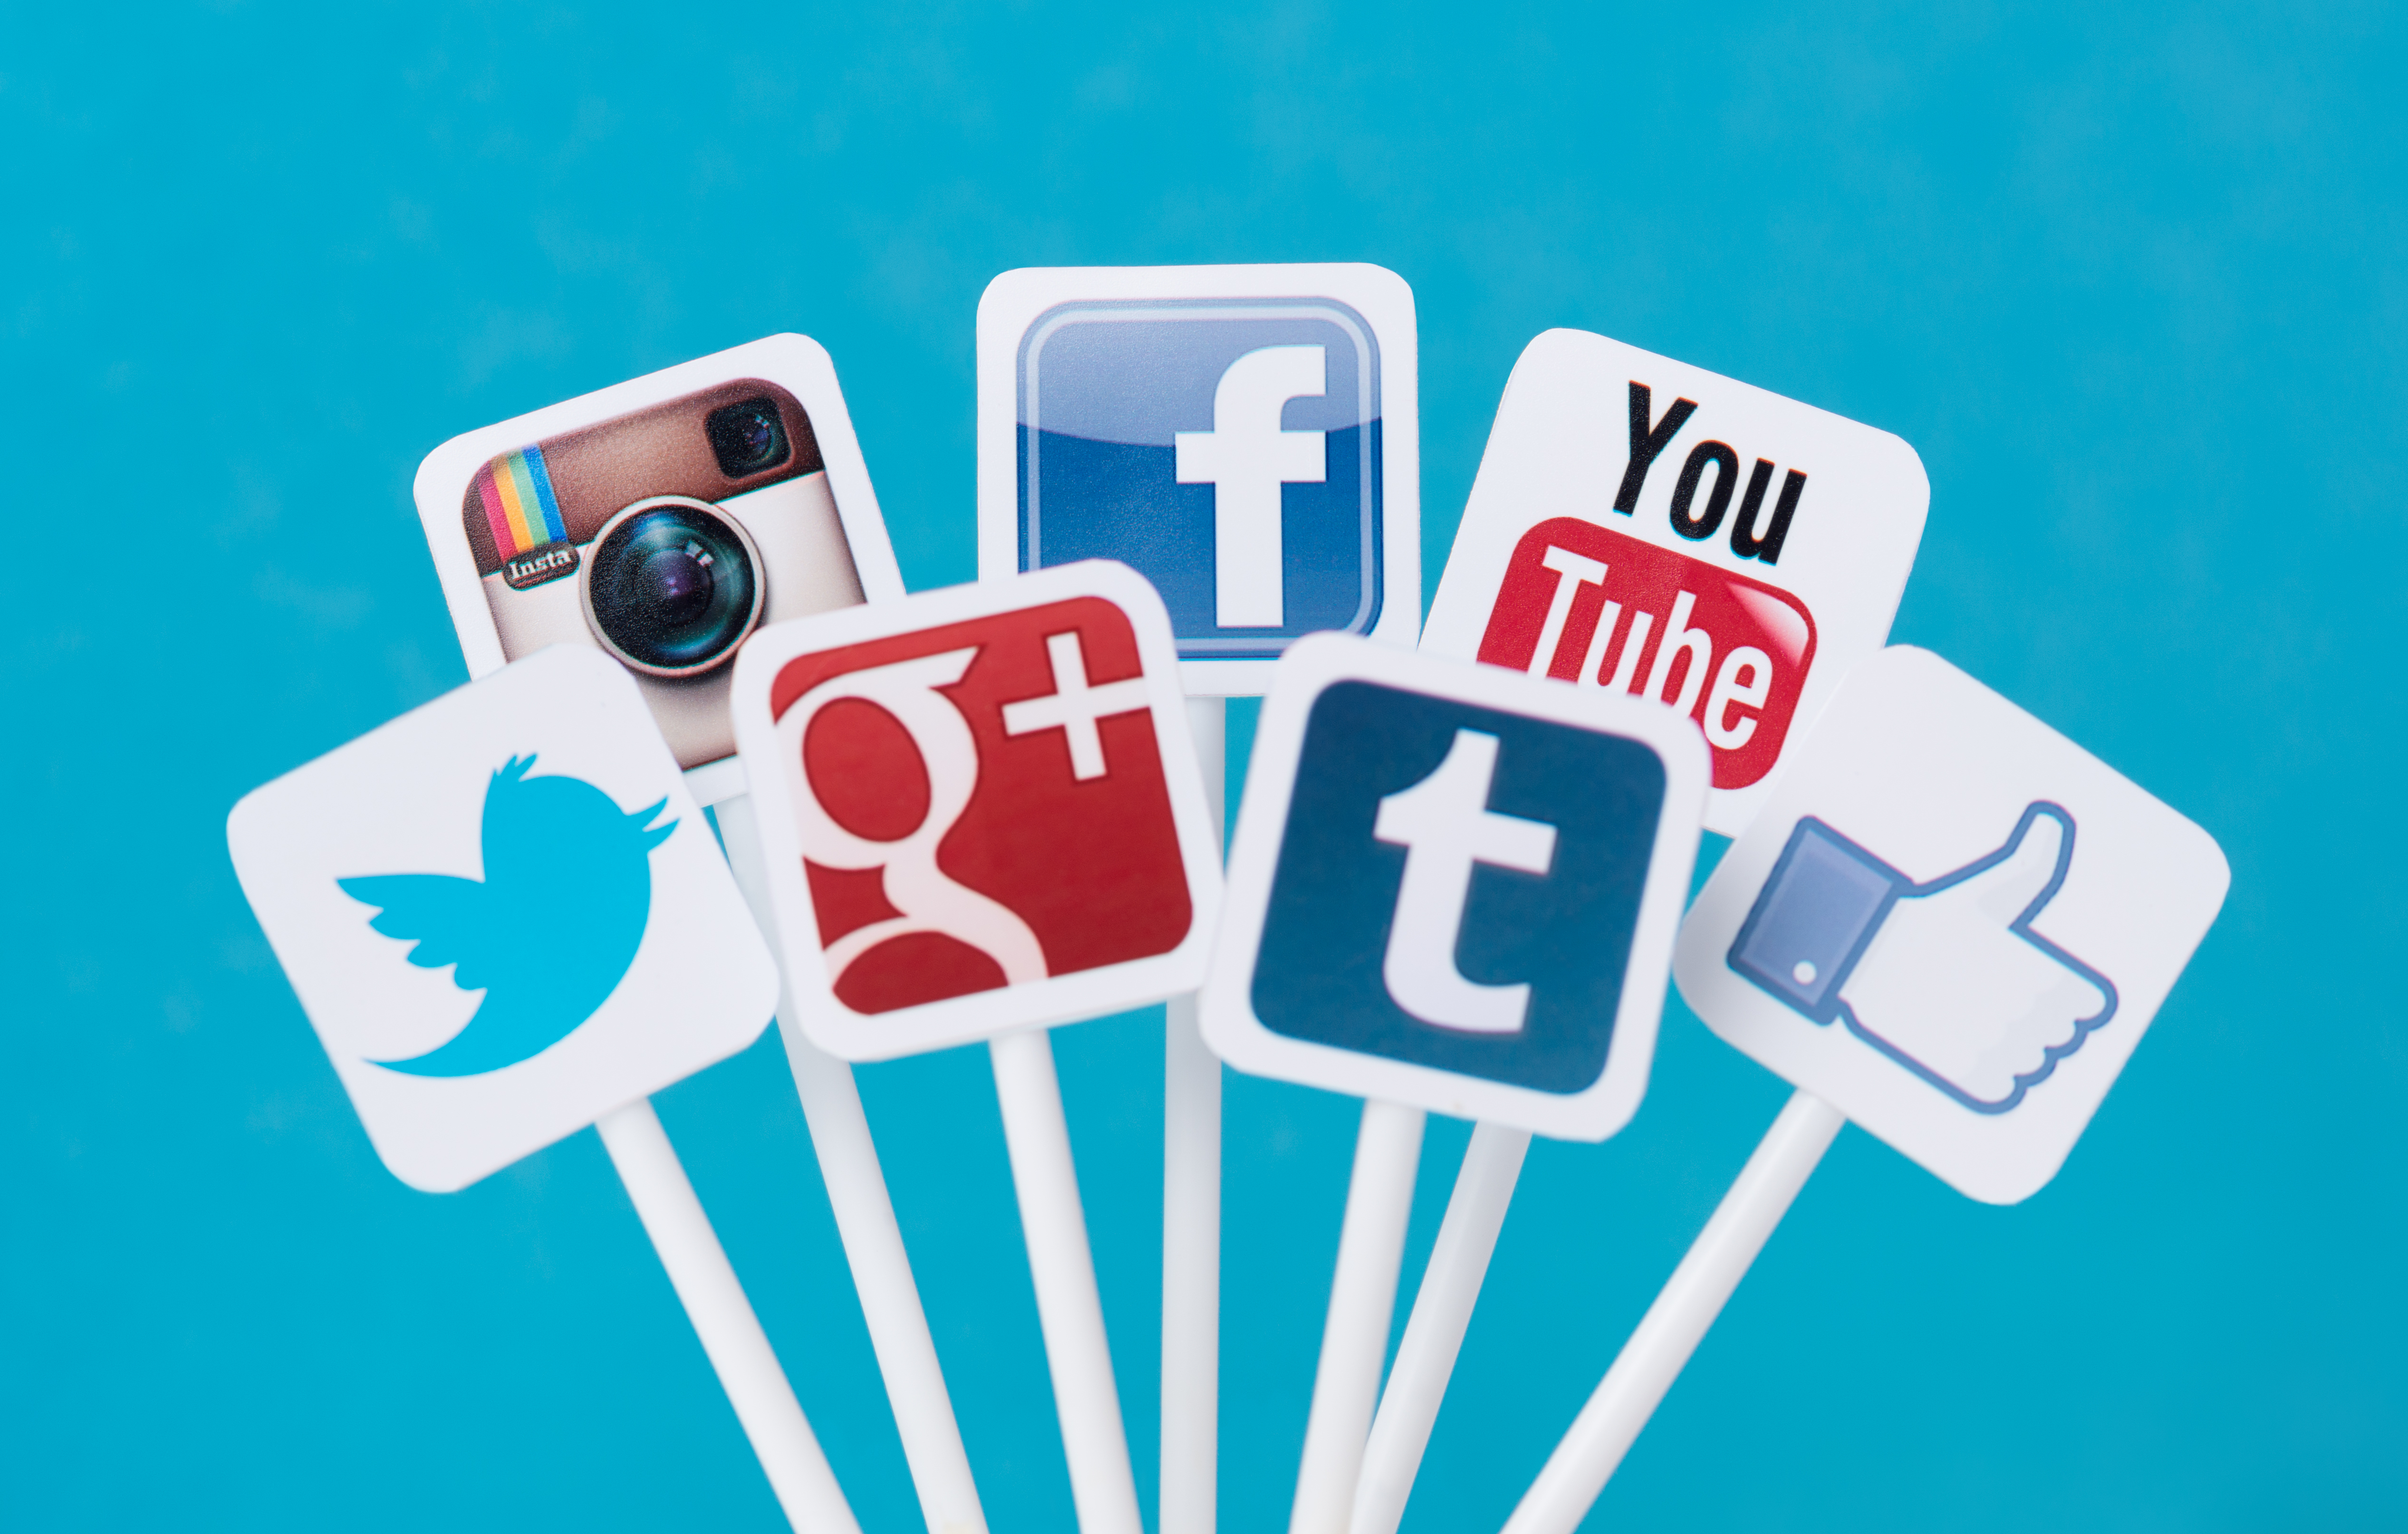 Use social media to show your appreciation